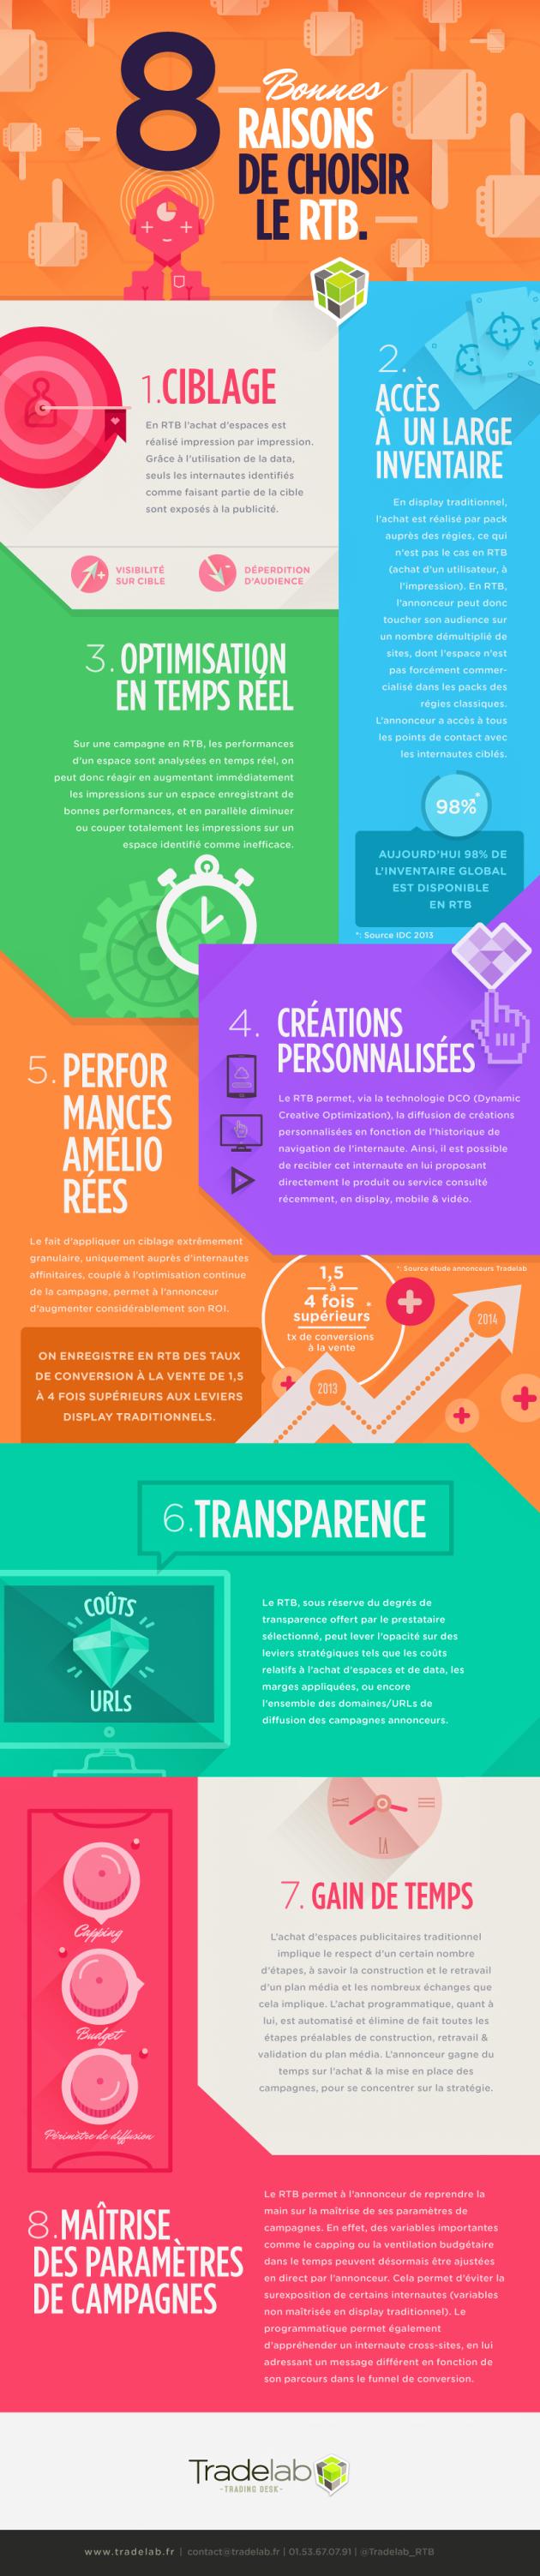 infographie-rtb-tradelab